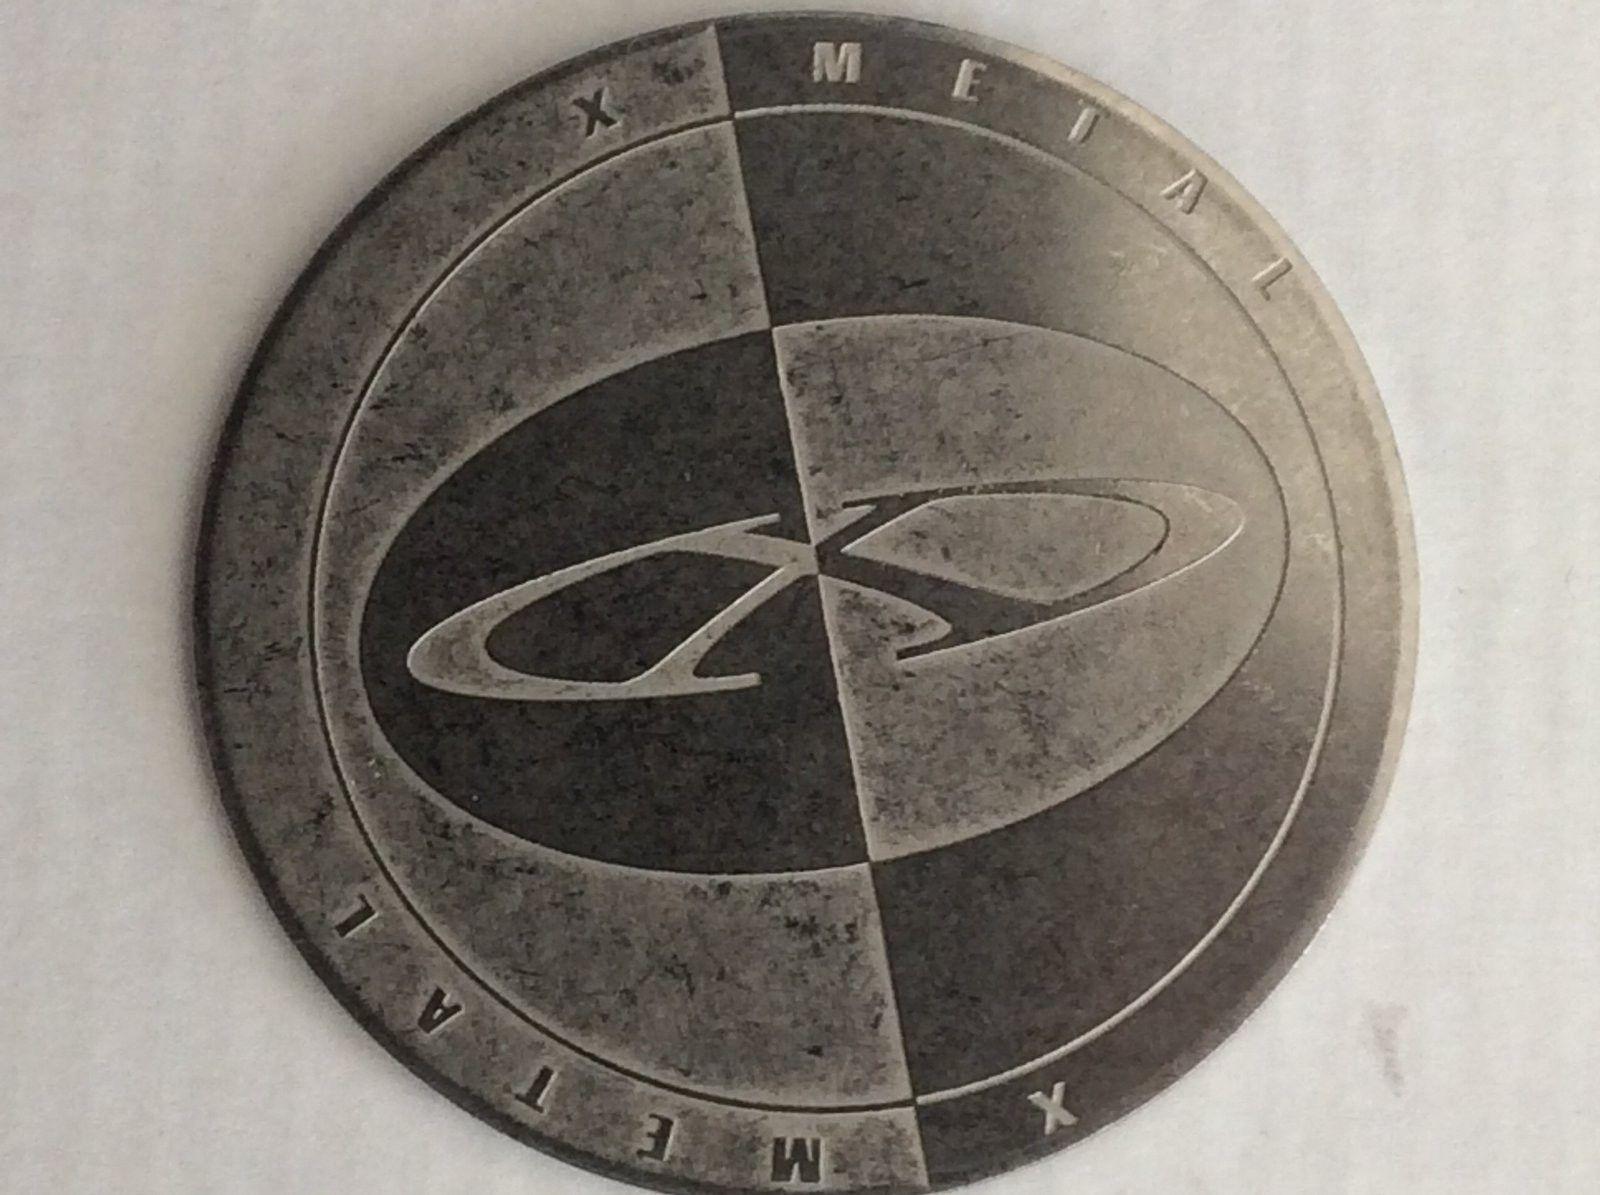 Mars coin - image.jpg